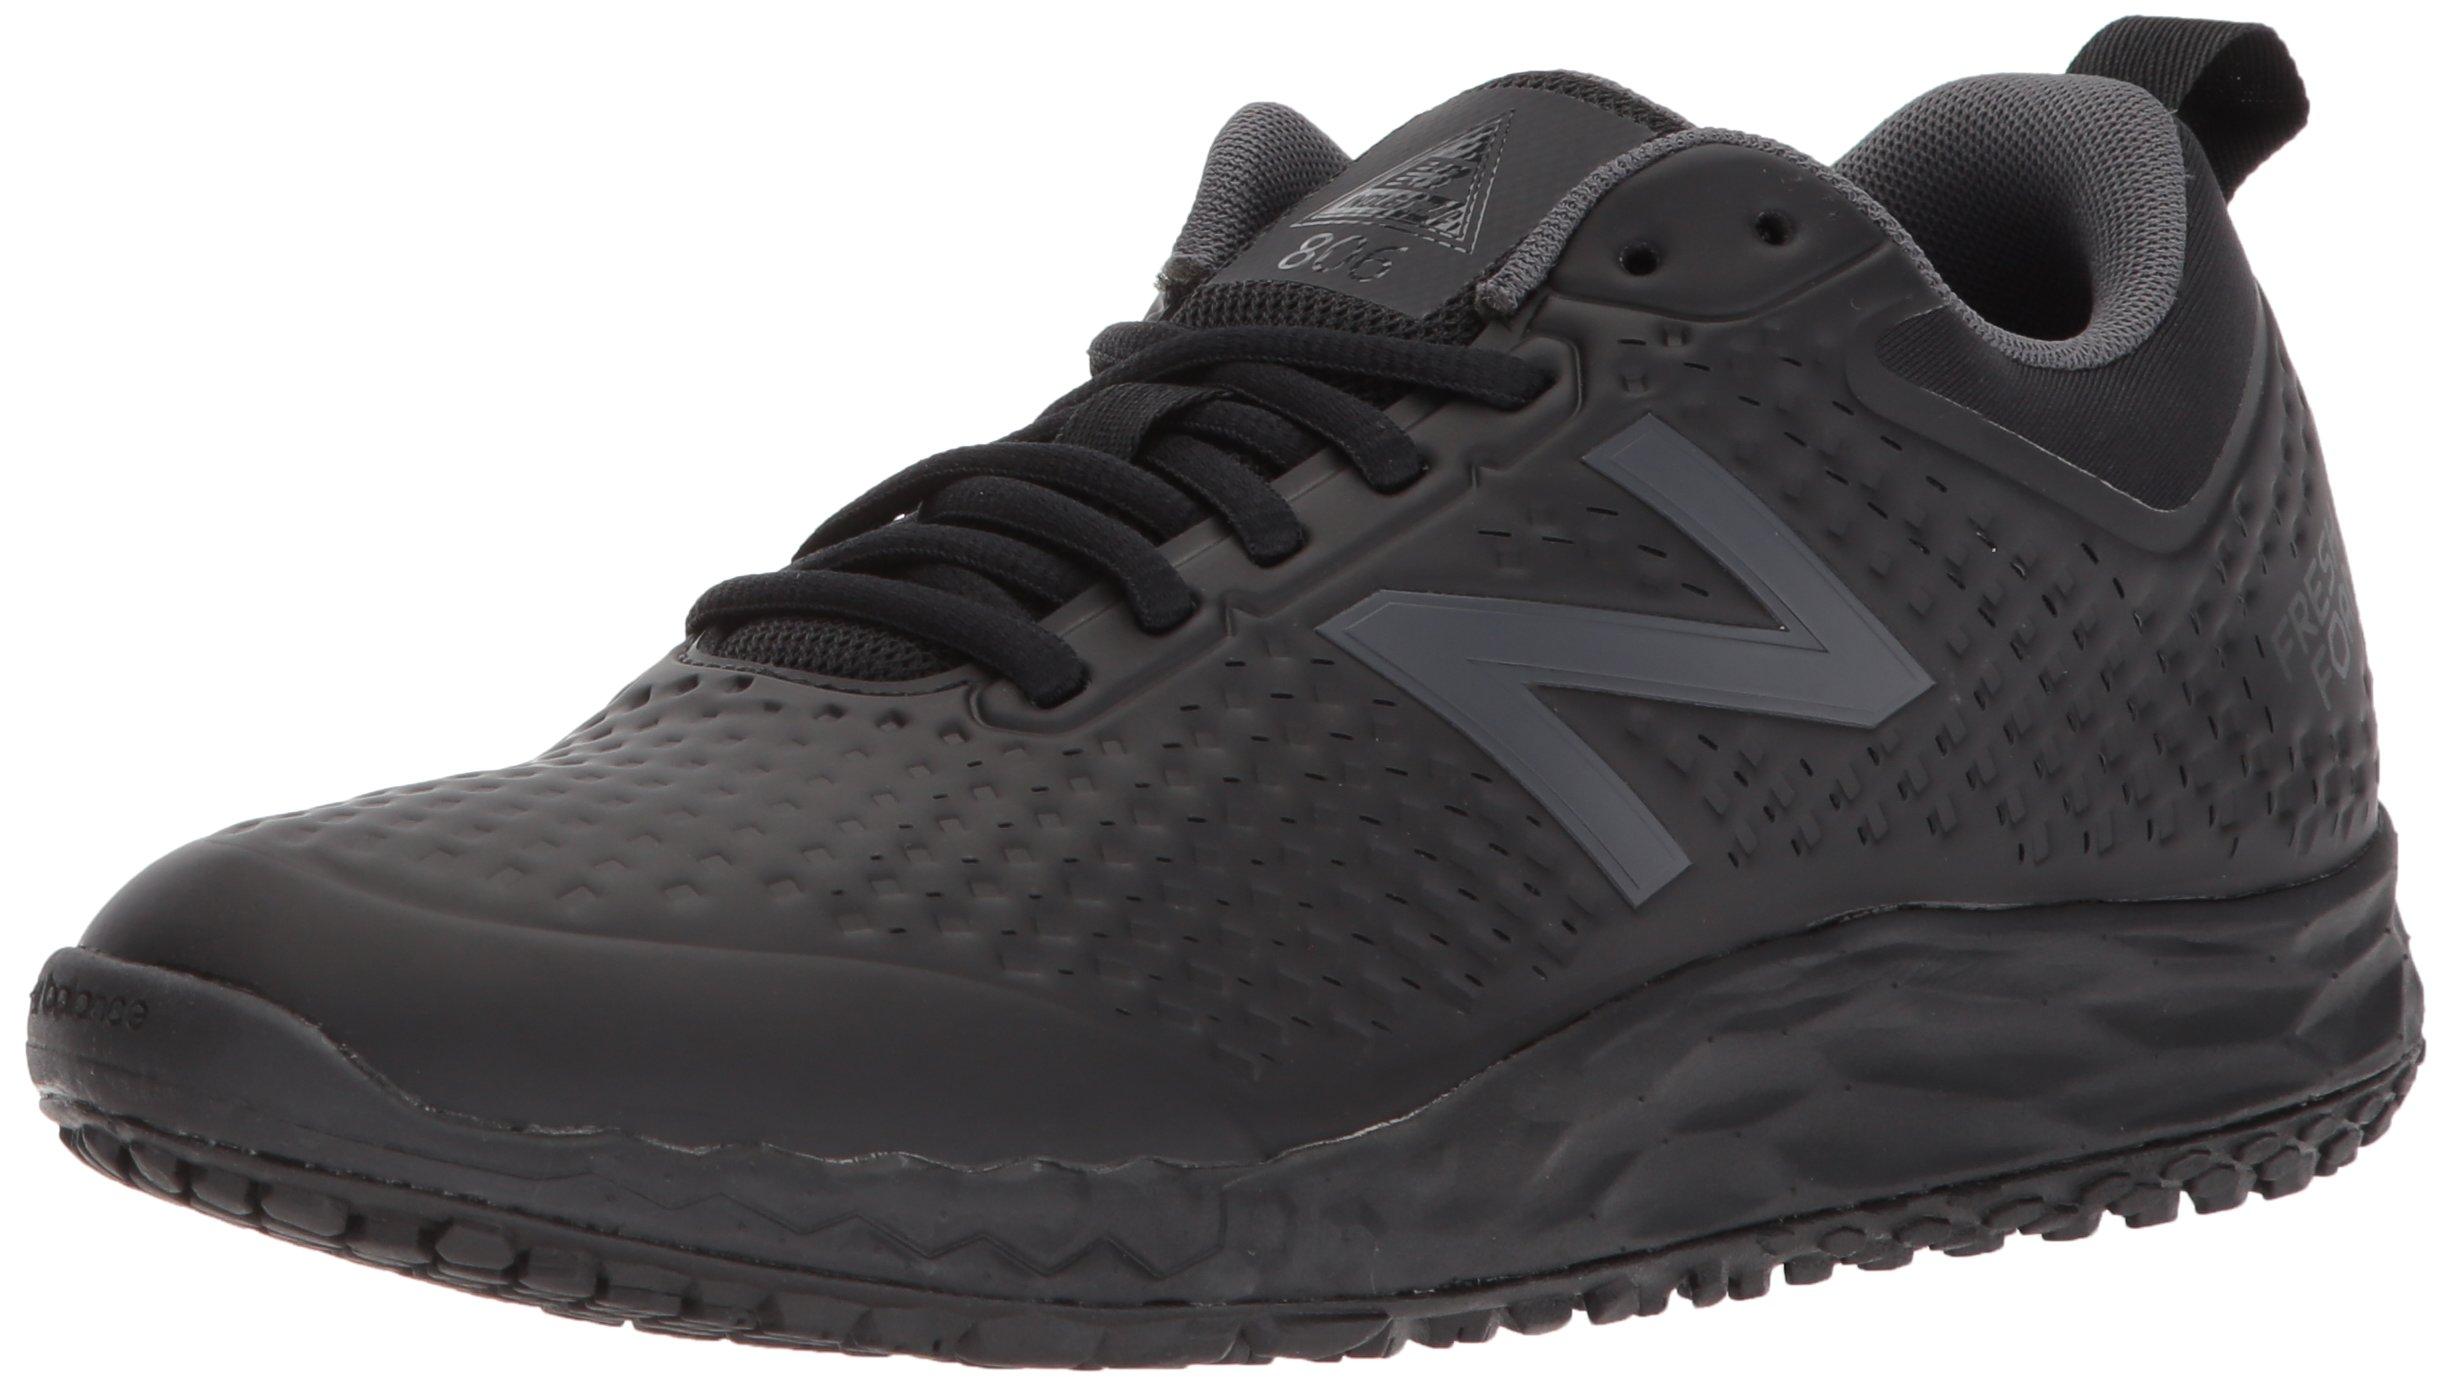 New Balance Women's 806v1 Work Training Shoe, Black, 10 D US